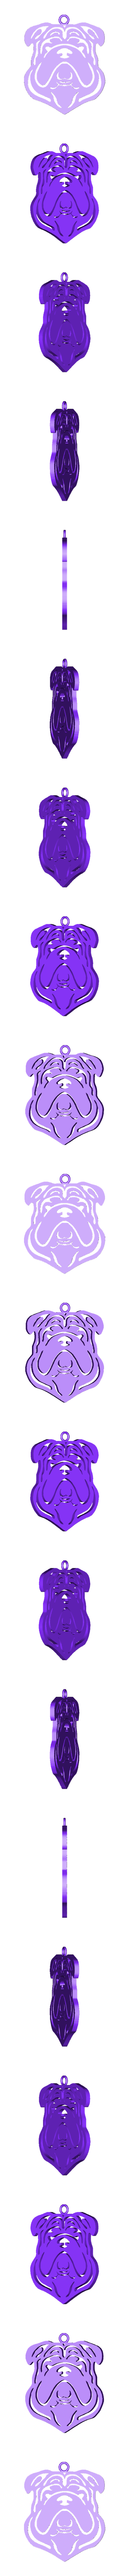 1.stl Download STL file Dogs • 3D printing object, GENNADI3313